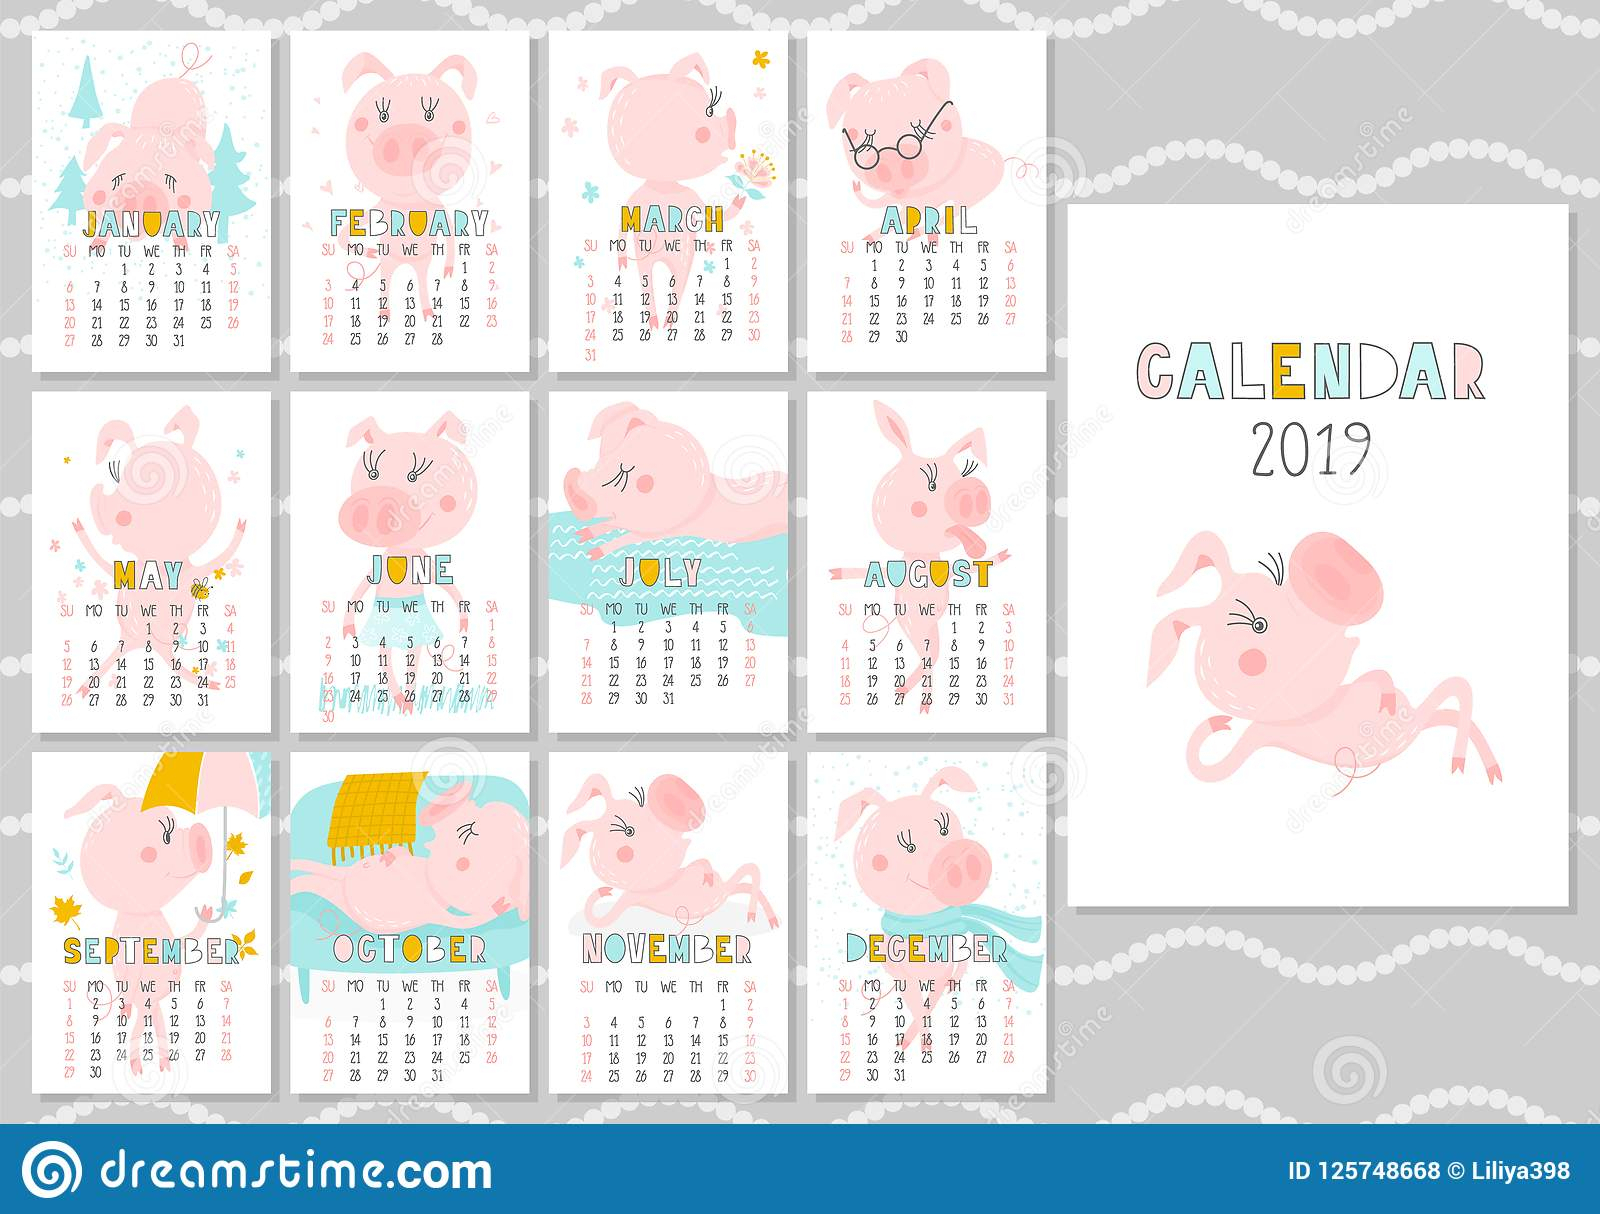 Six Year Calendar  2017, 2018, 2019, 2020, 2021 And 2022 inside Lunar Calendar For Cockfighting